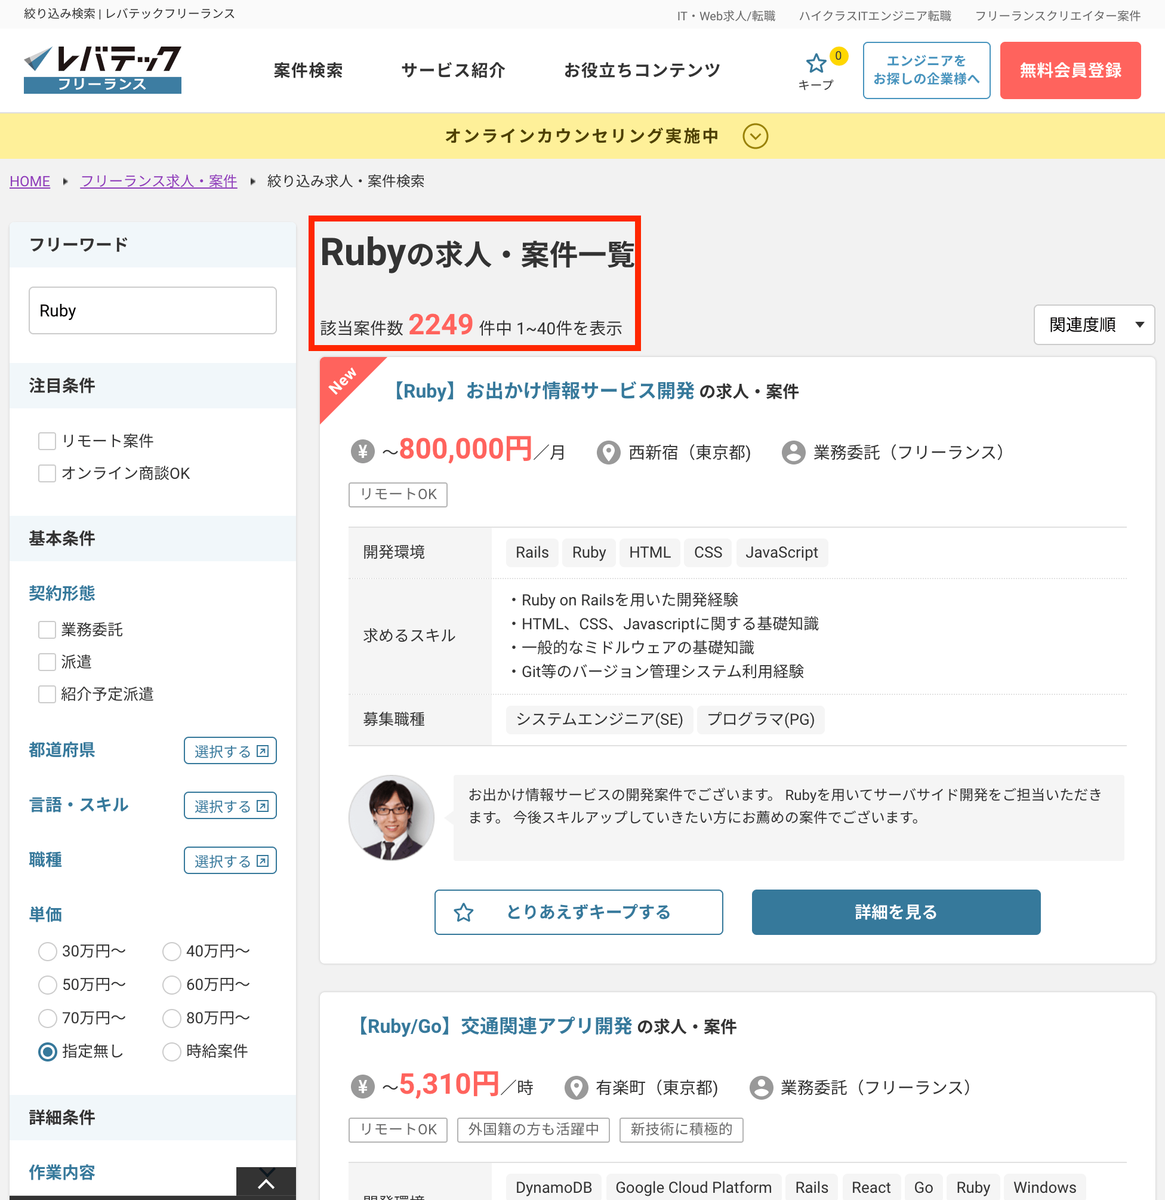 Ruby案件 2249件 レバテックフリーランス